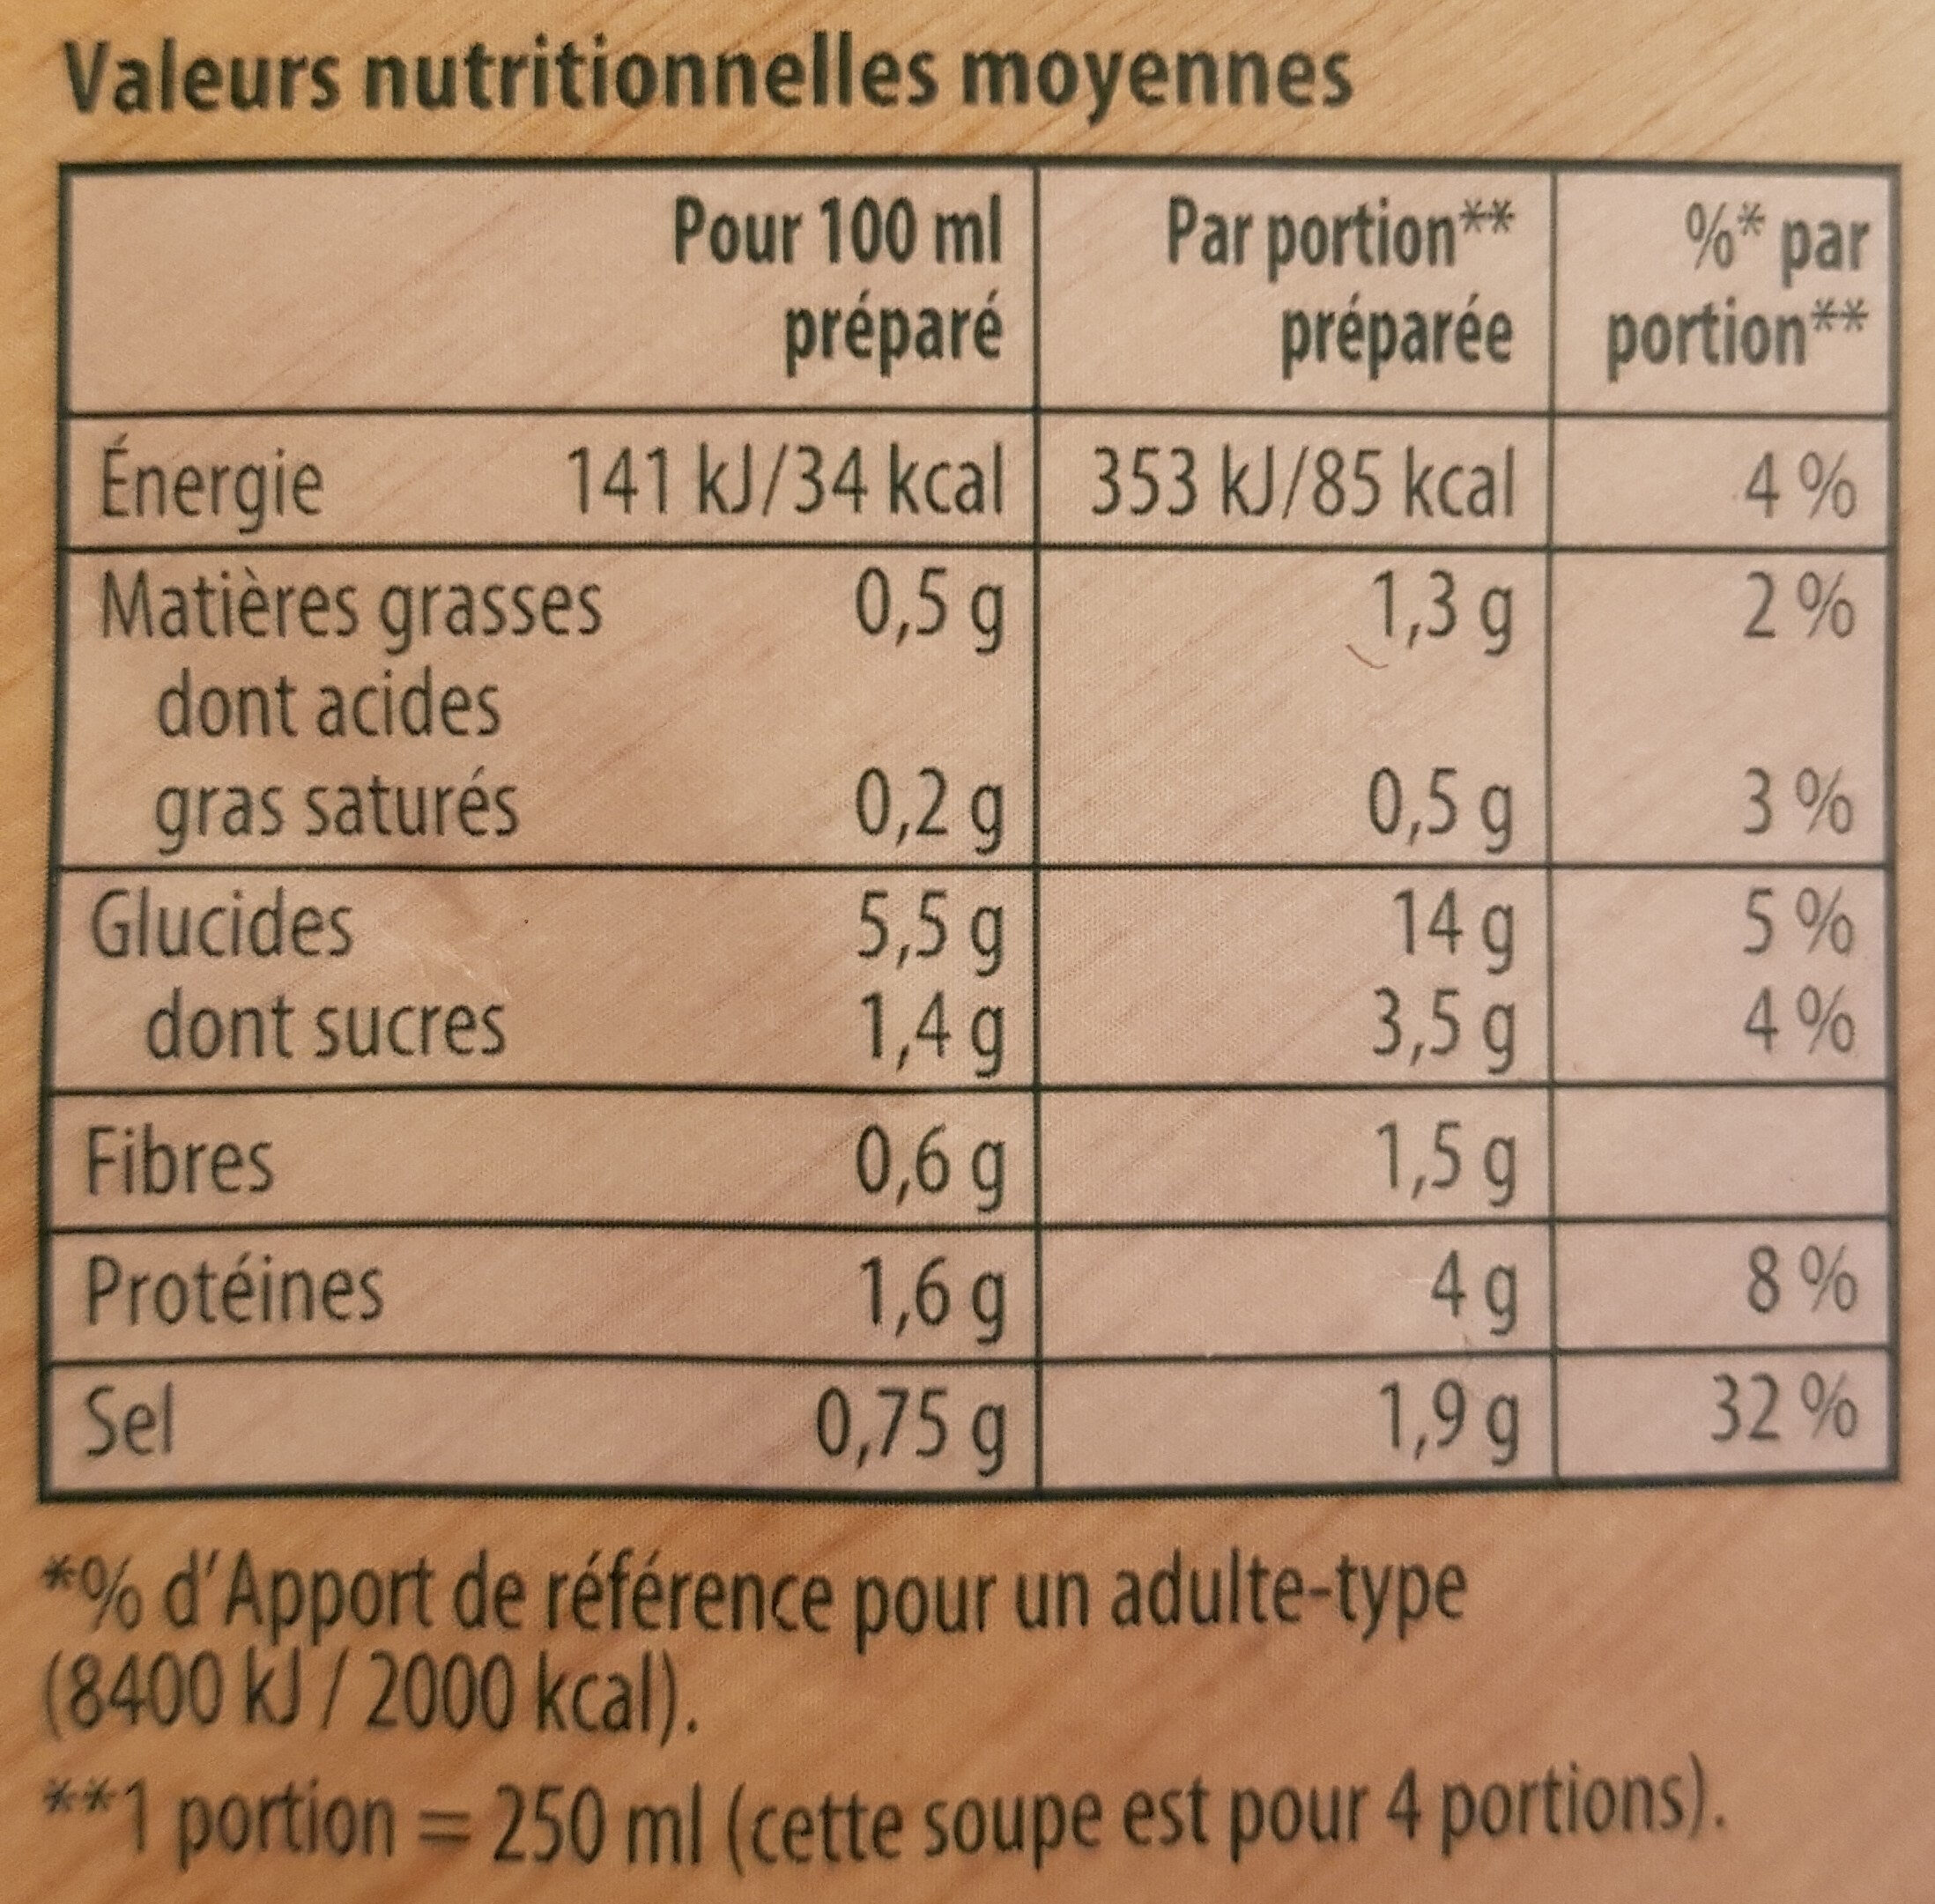 Knorr Soupe Chorba Marocaine au Mouton-Halal 100g 4 Portions - Nutrition facts - fr